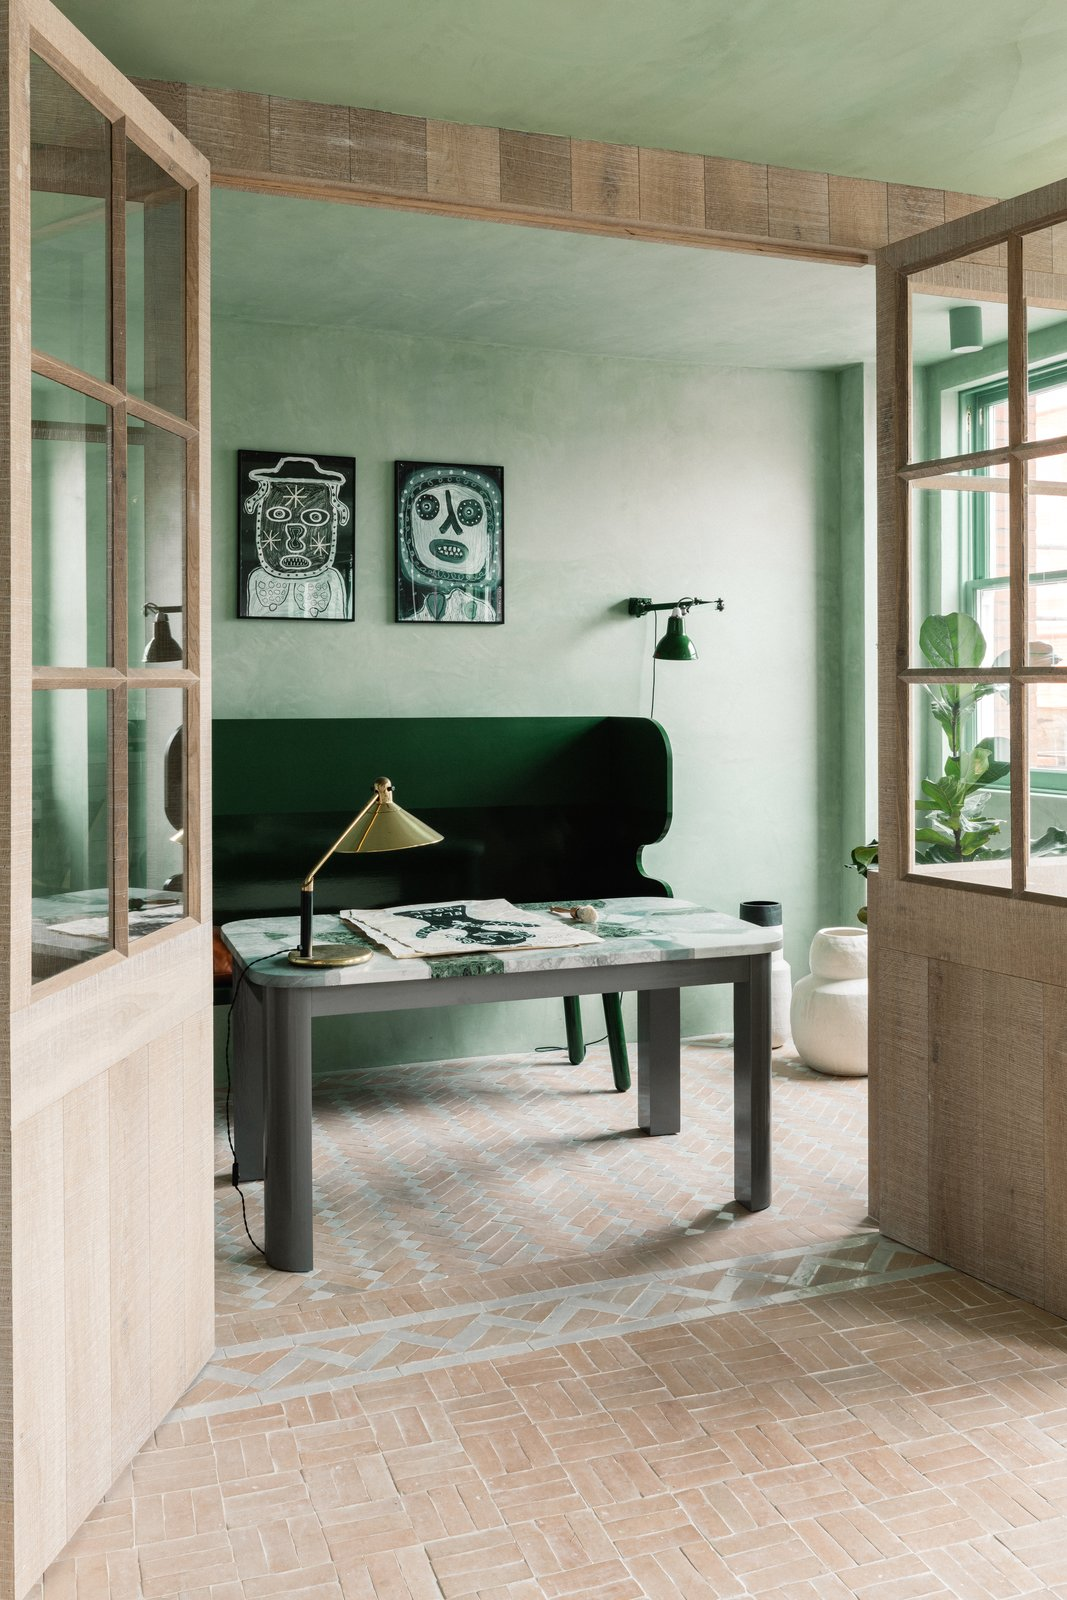 The Beldi Chan + Eayrs living area